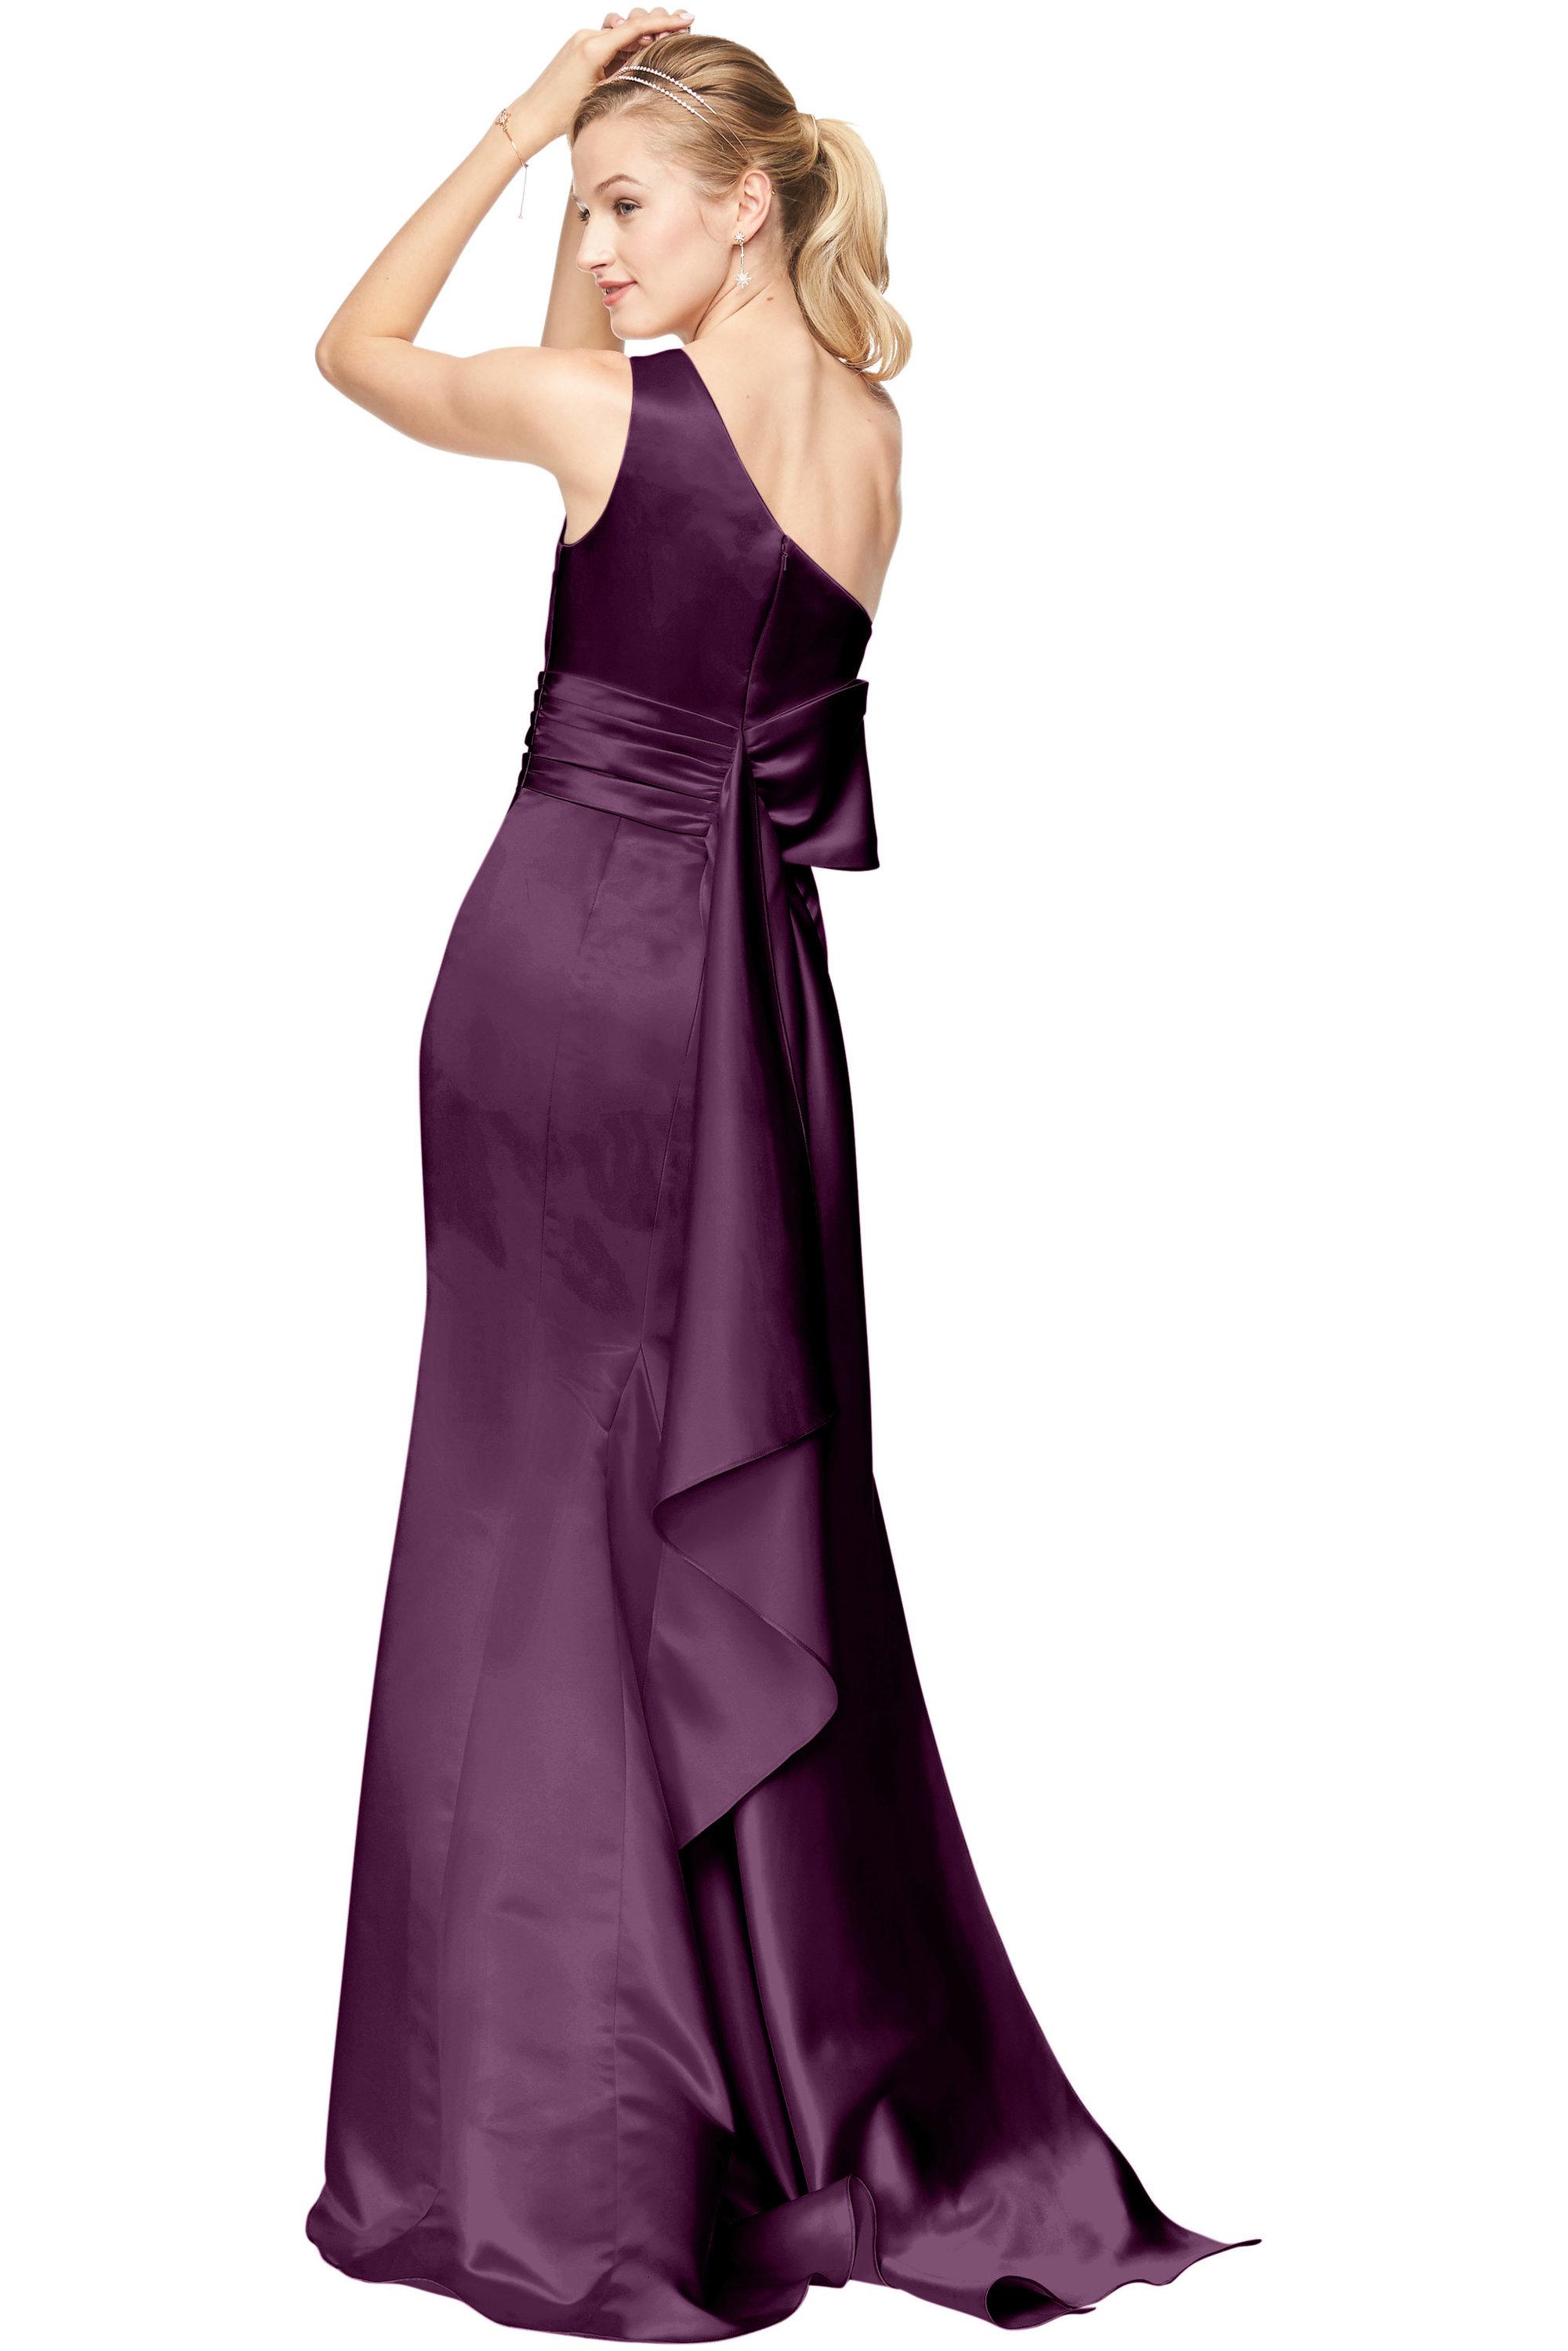 Bill Levkoff EURO EGGPLANT Euro Satin One-Shoulder A-Line gown, $210.00 Back